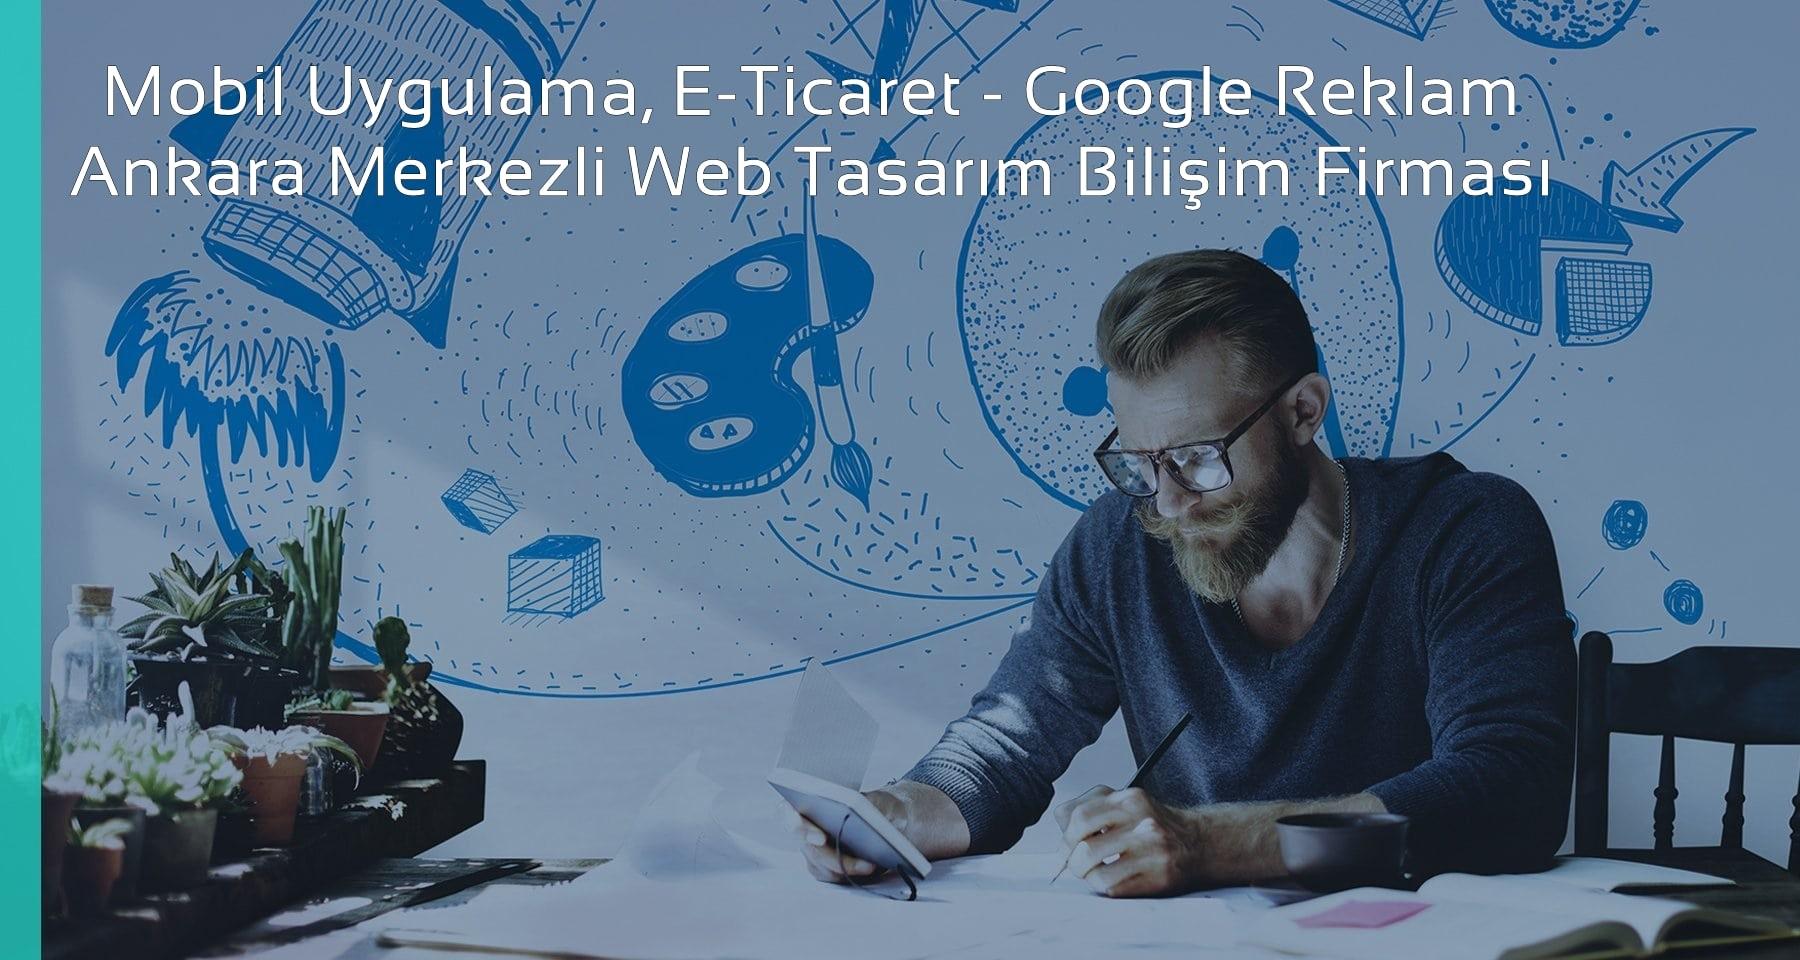 Ankara Google Reklam